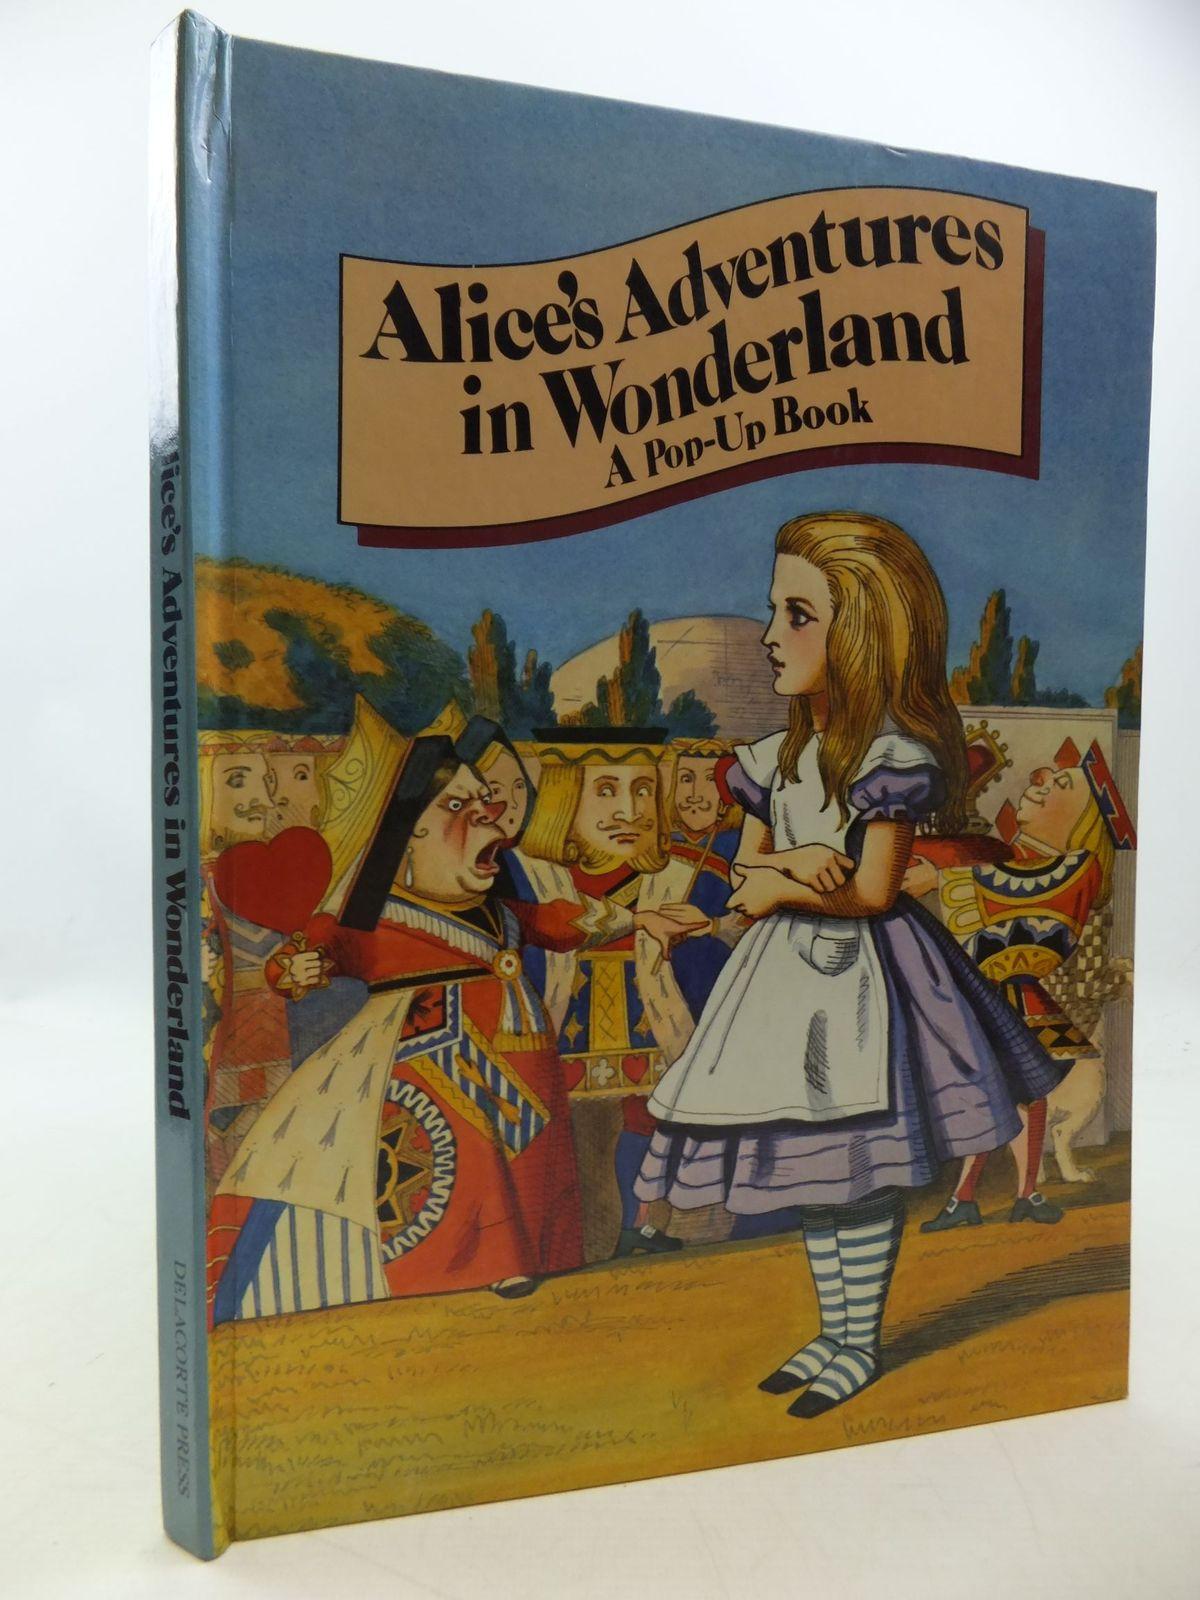 Photo of ALICE'S ADVENTURES IN WONDERLAND A POP-UP BOOK